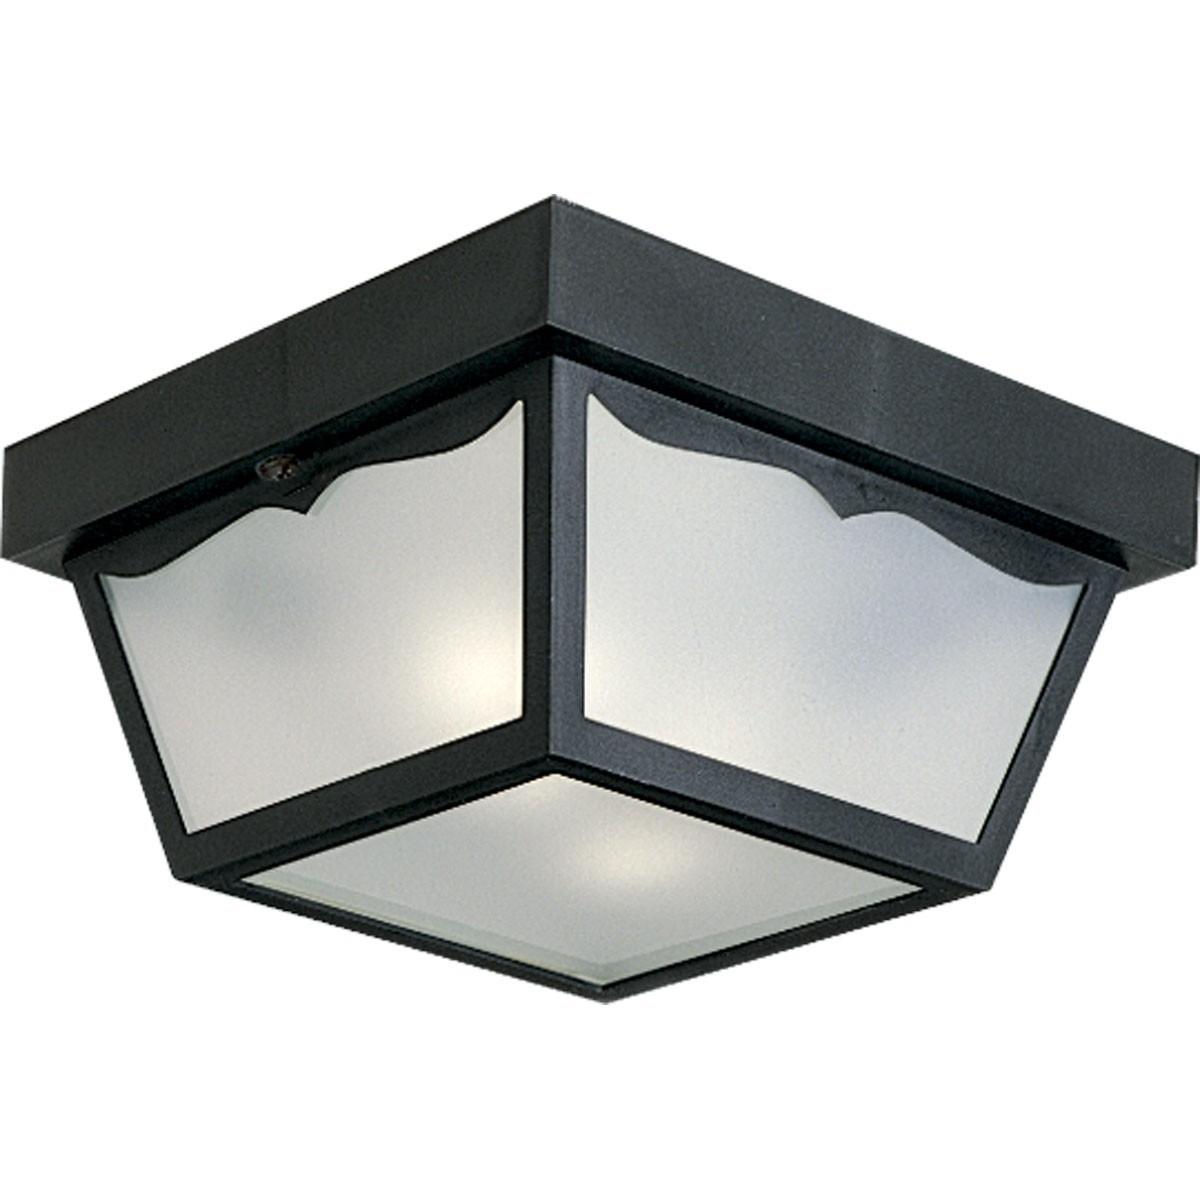 2019 60W Outdoor Flush Mount Non Metallic Ceiling Light – Progress With Regard To Outdoor Motion Sensor Ceiling Mount Lights (View 15 of 20)